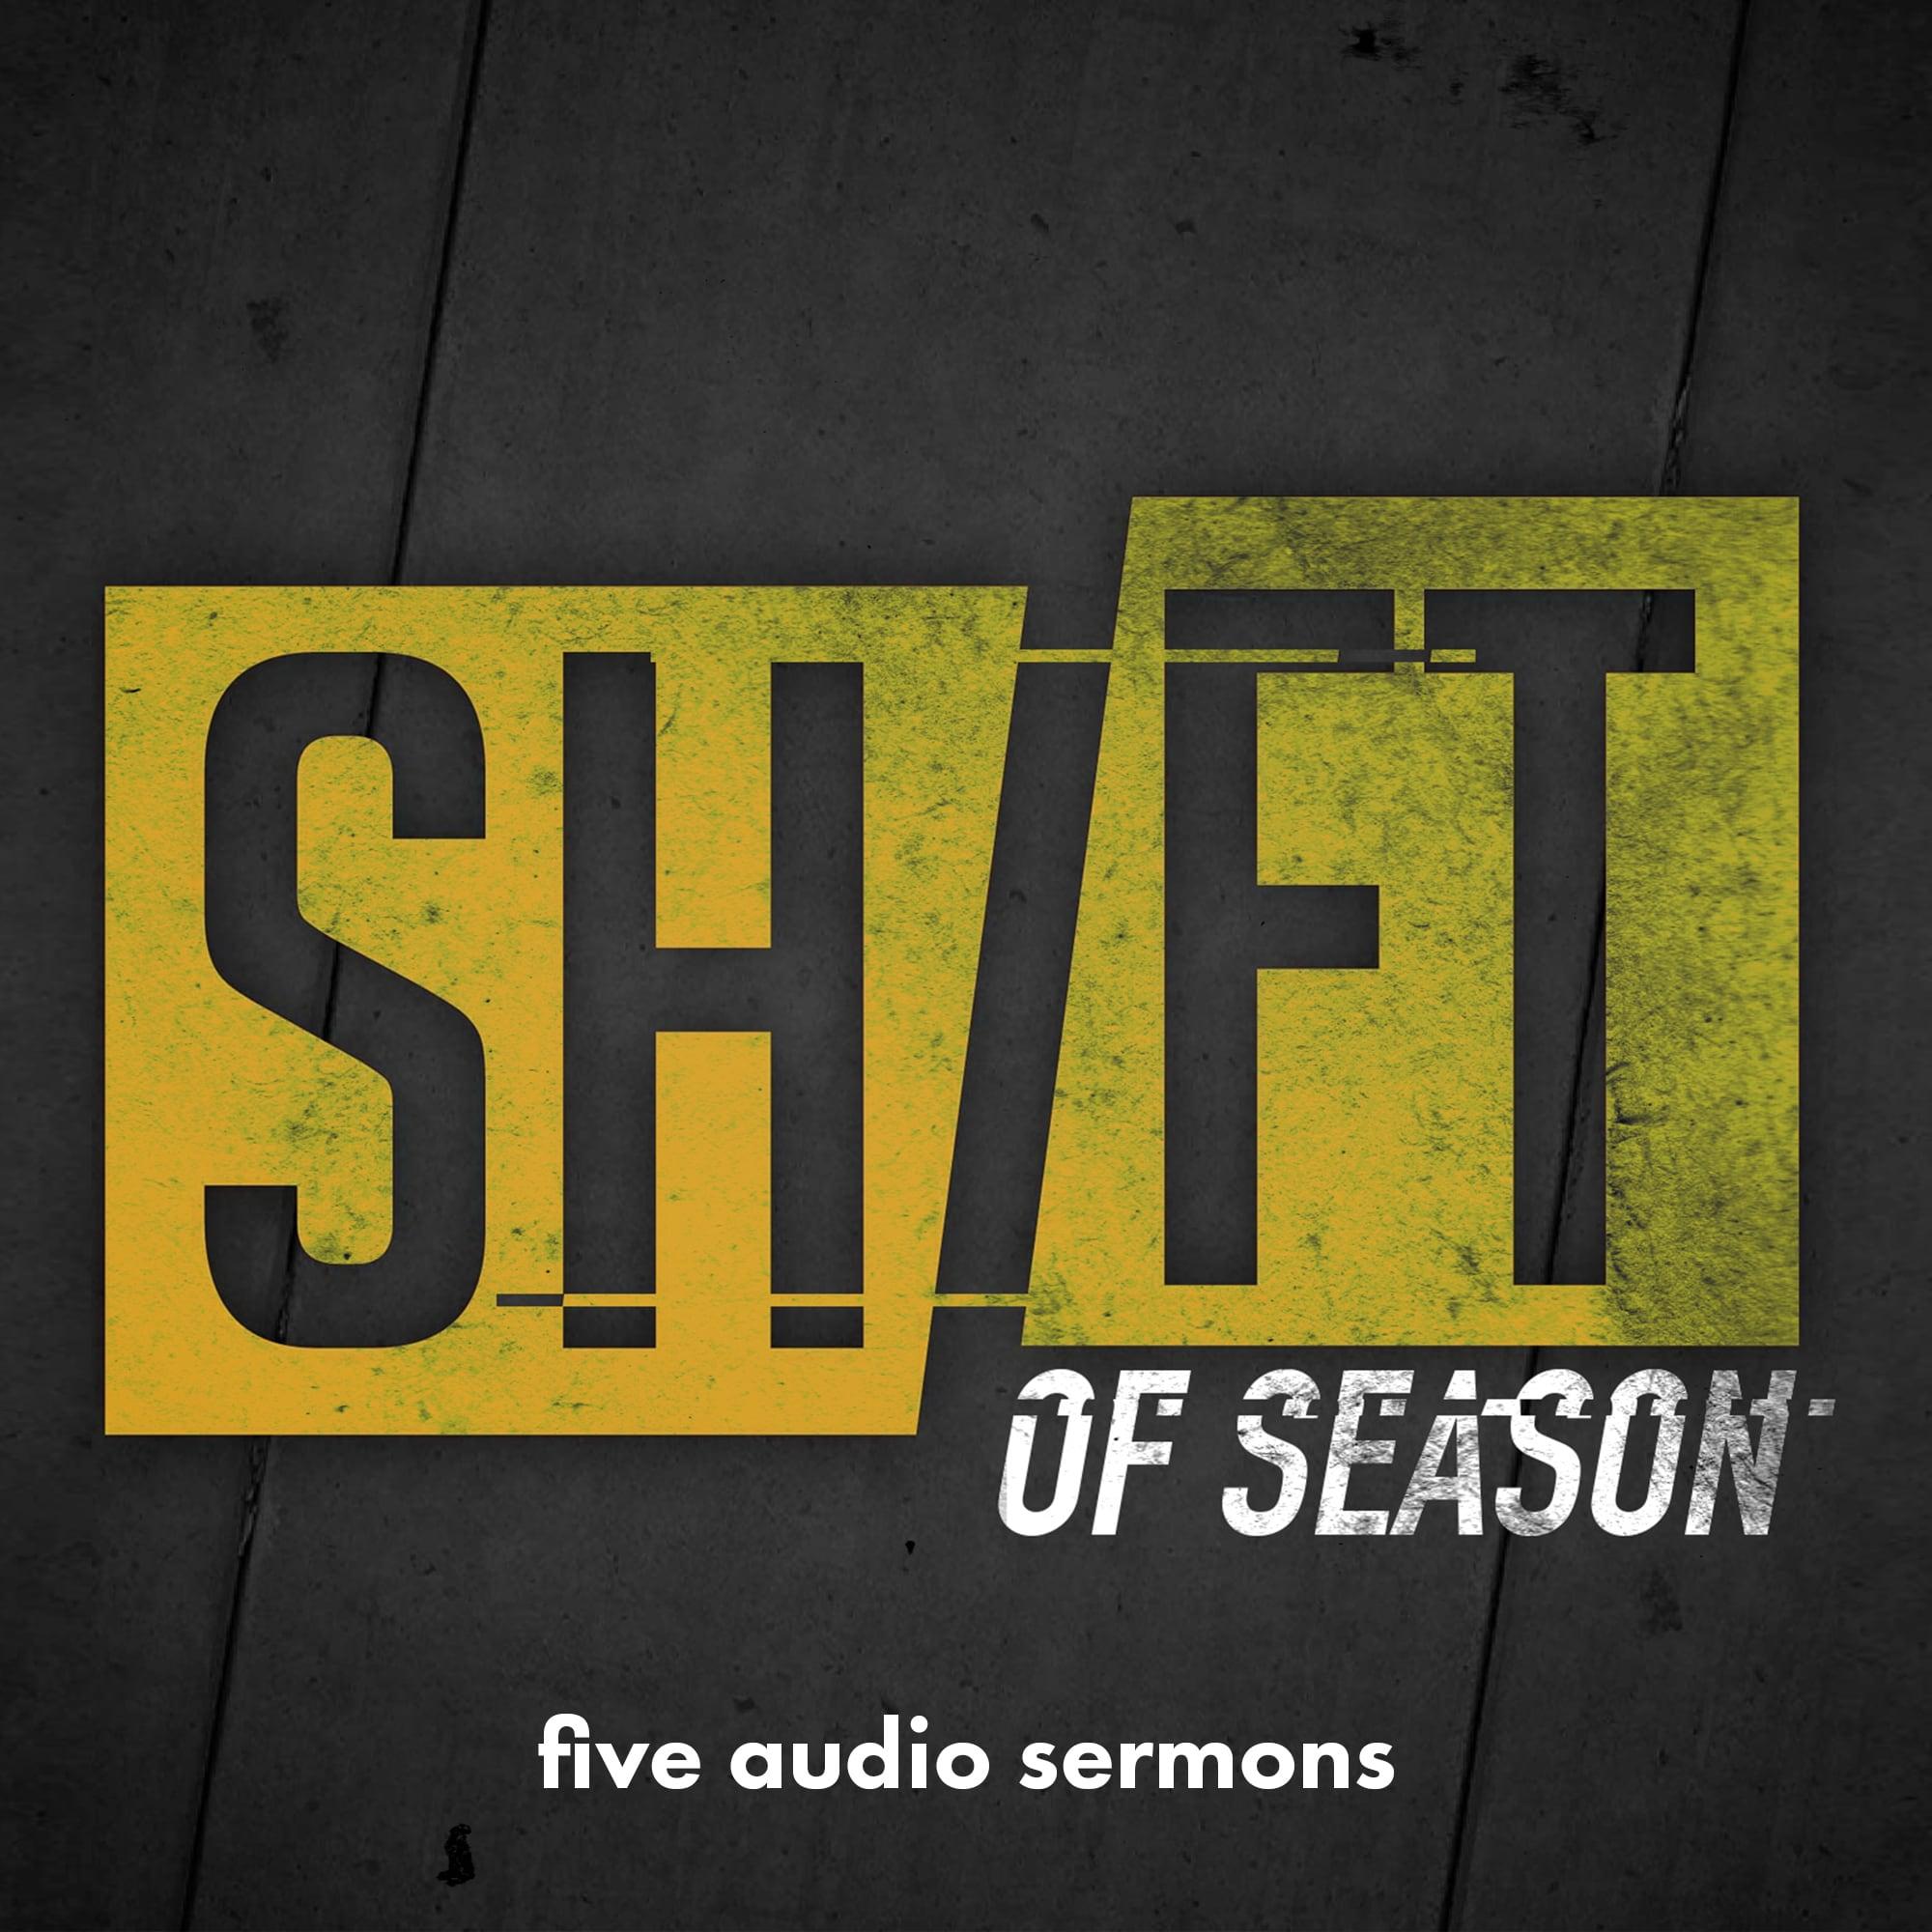 Series: Shift of Season